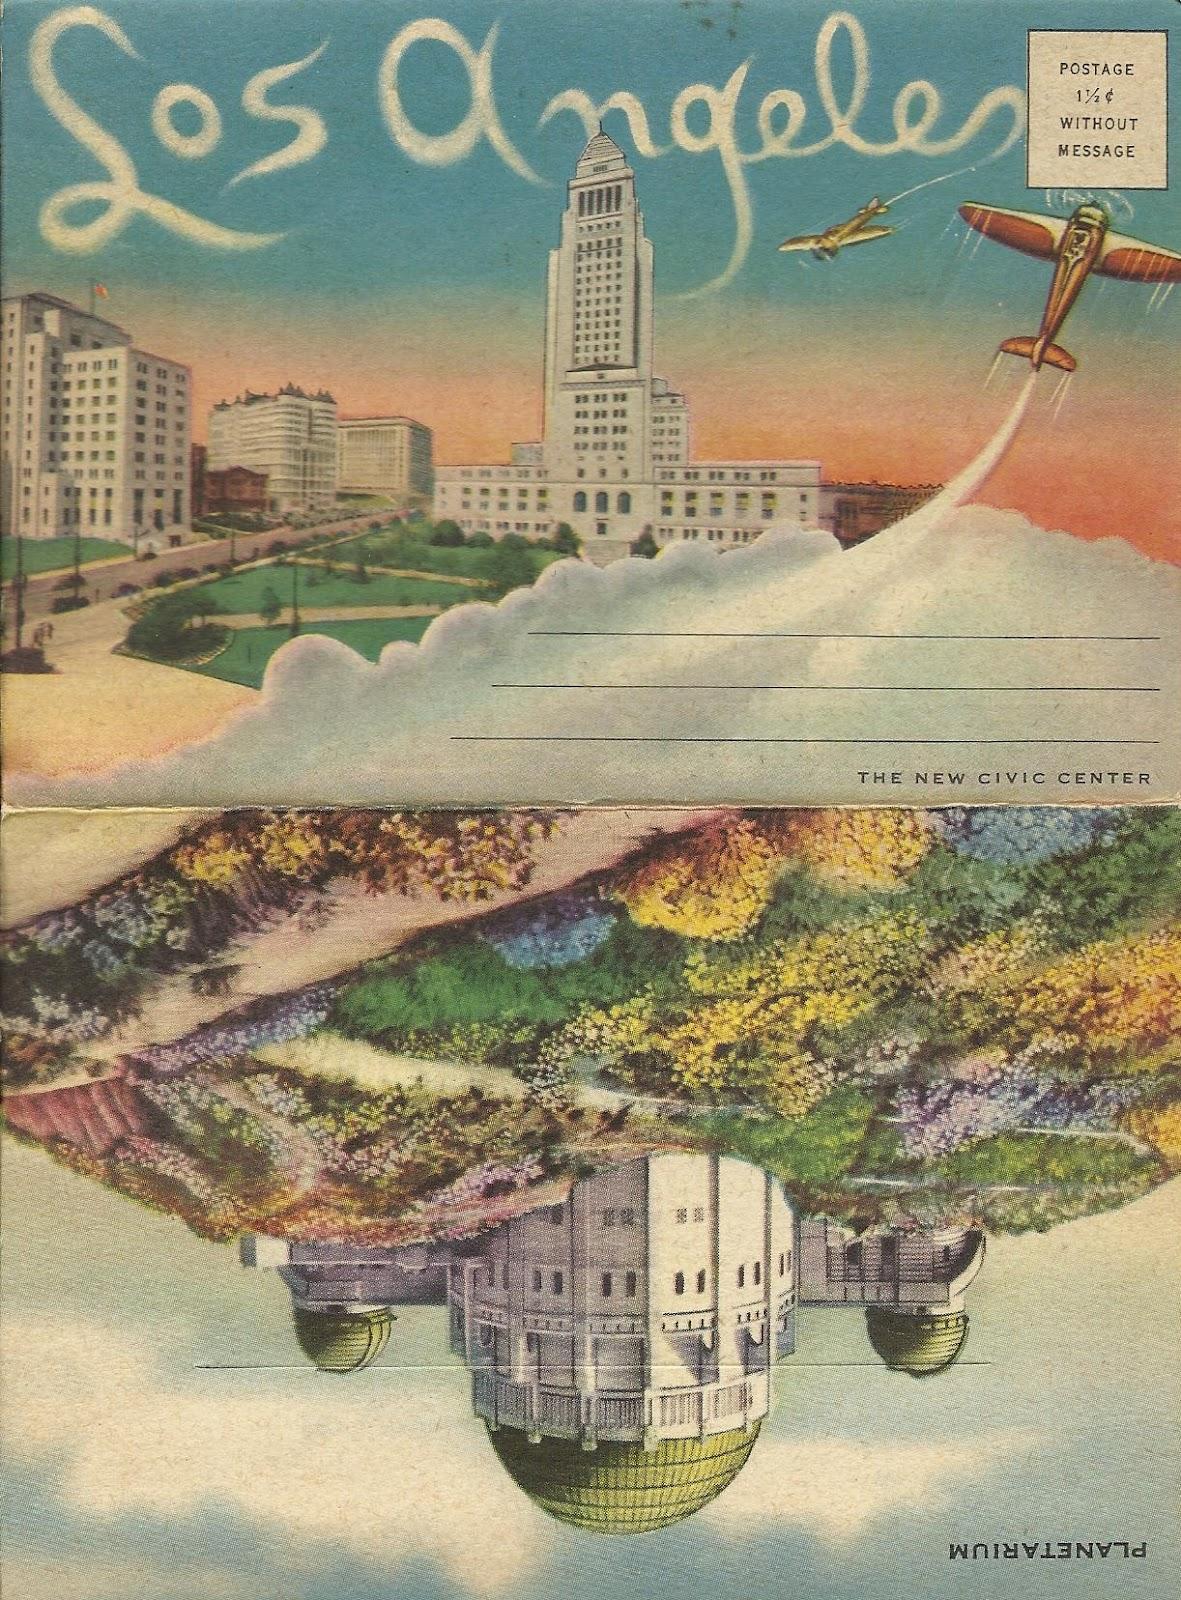 Vintage Travel Postcards March 2012